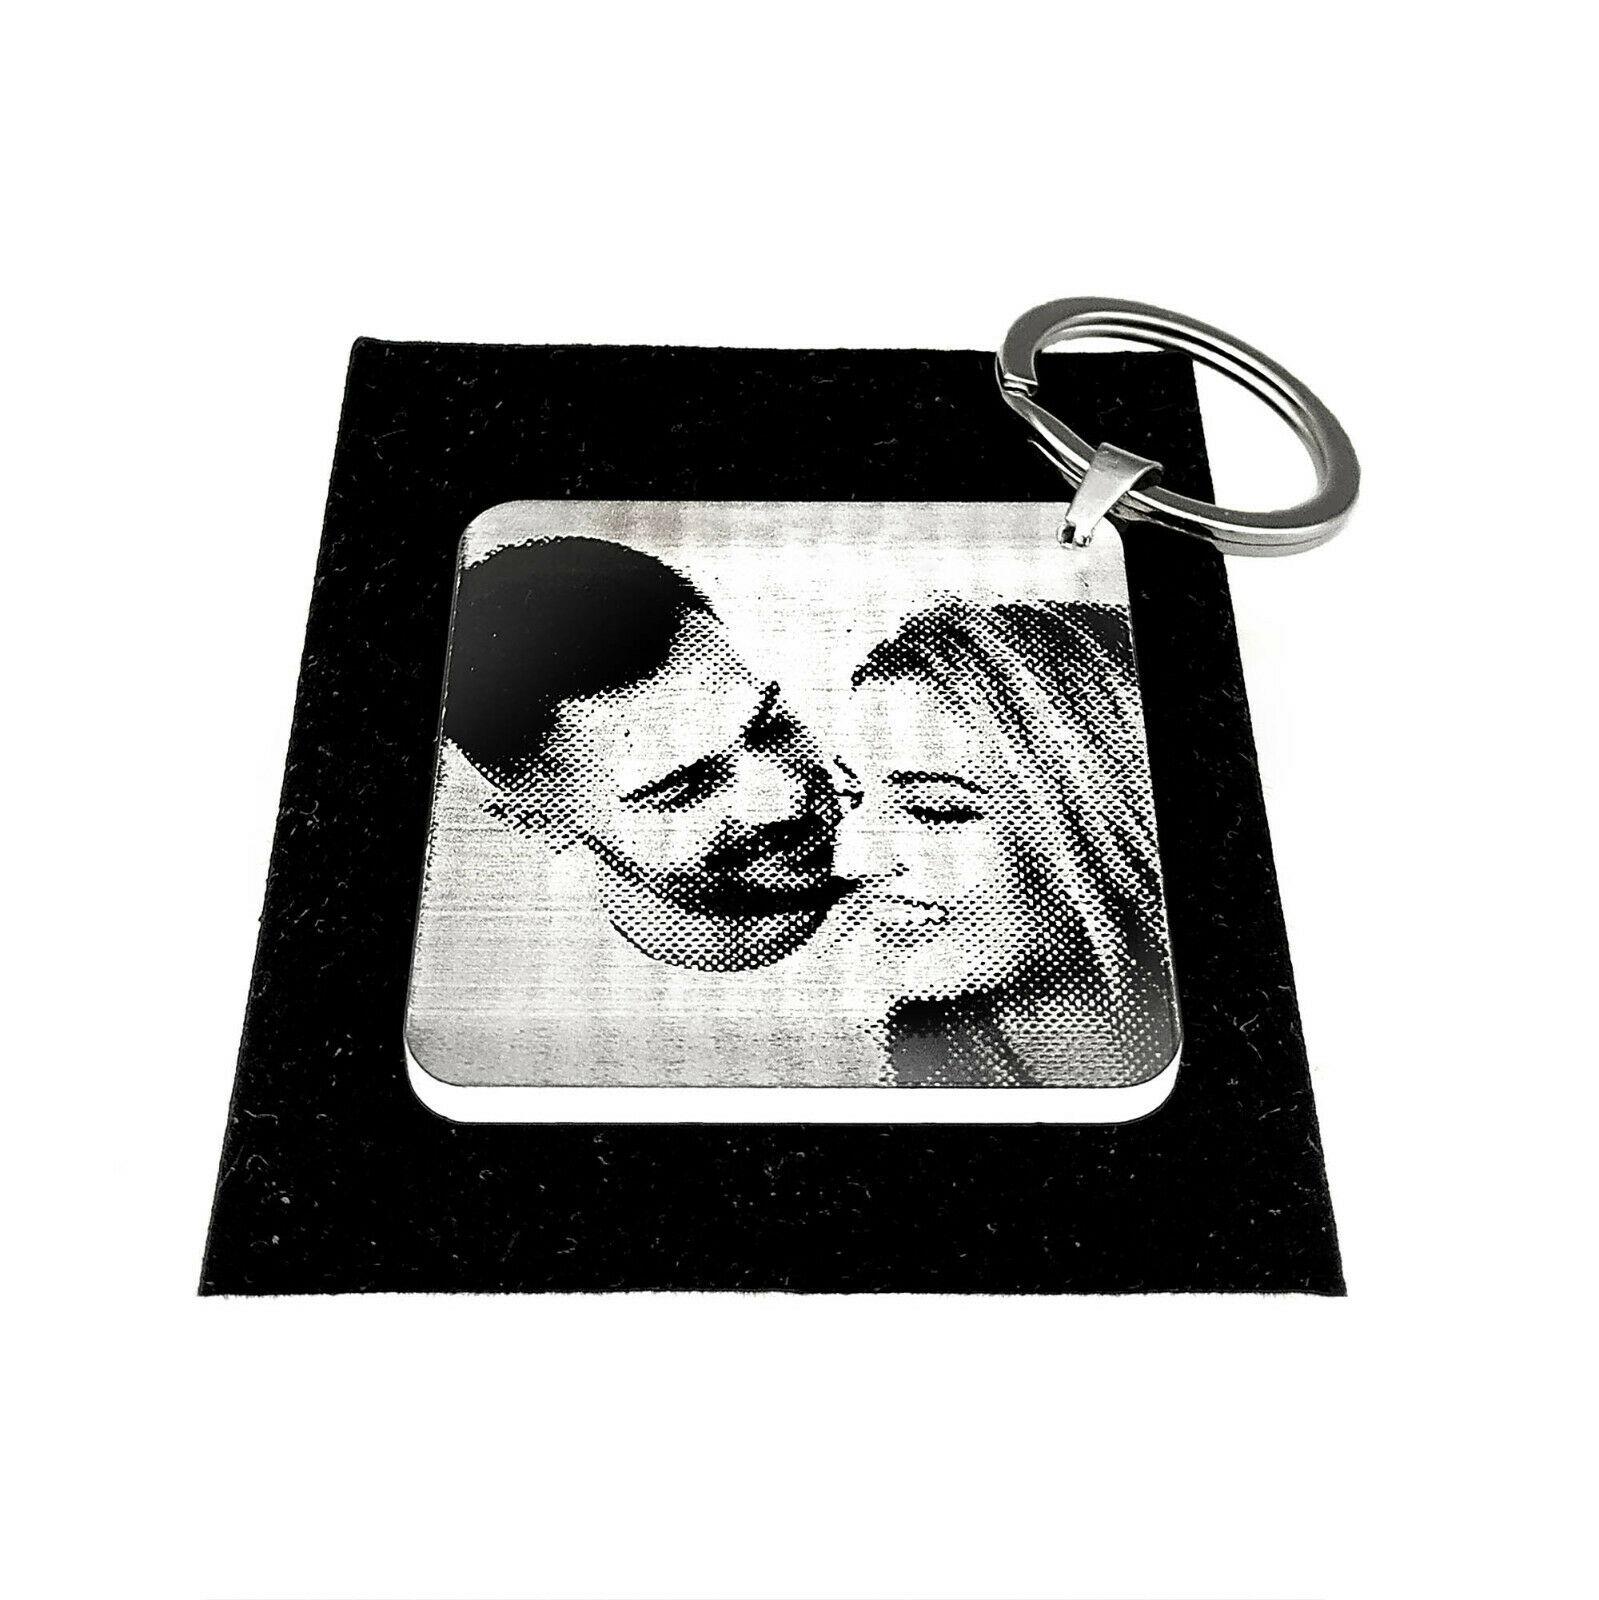 Acrylglas Schlüsselanhänger mit Fotogravur - Acryl Anhänger - Laser Bildgravur